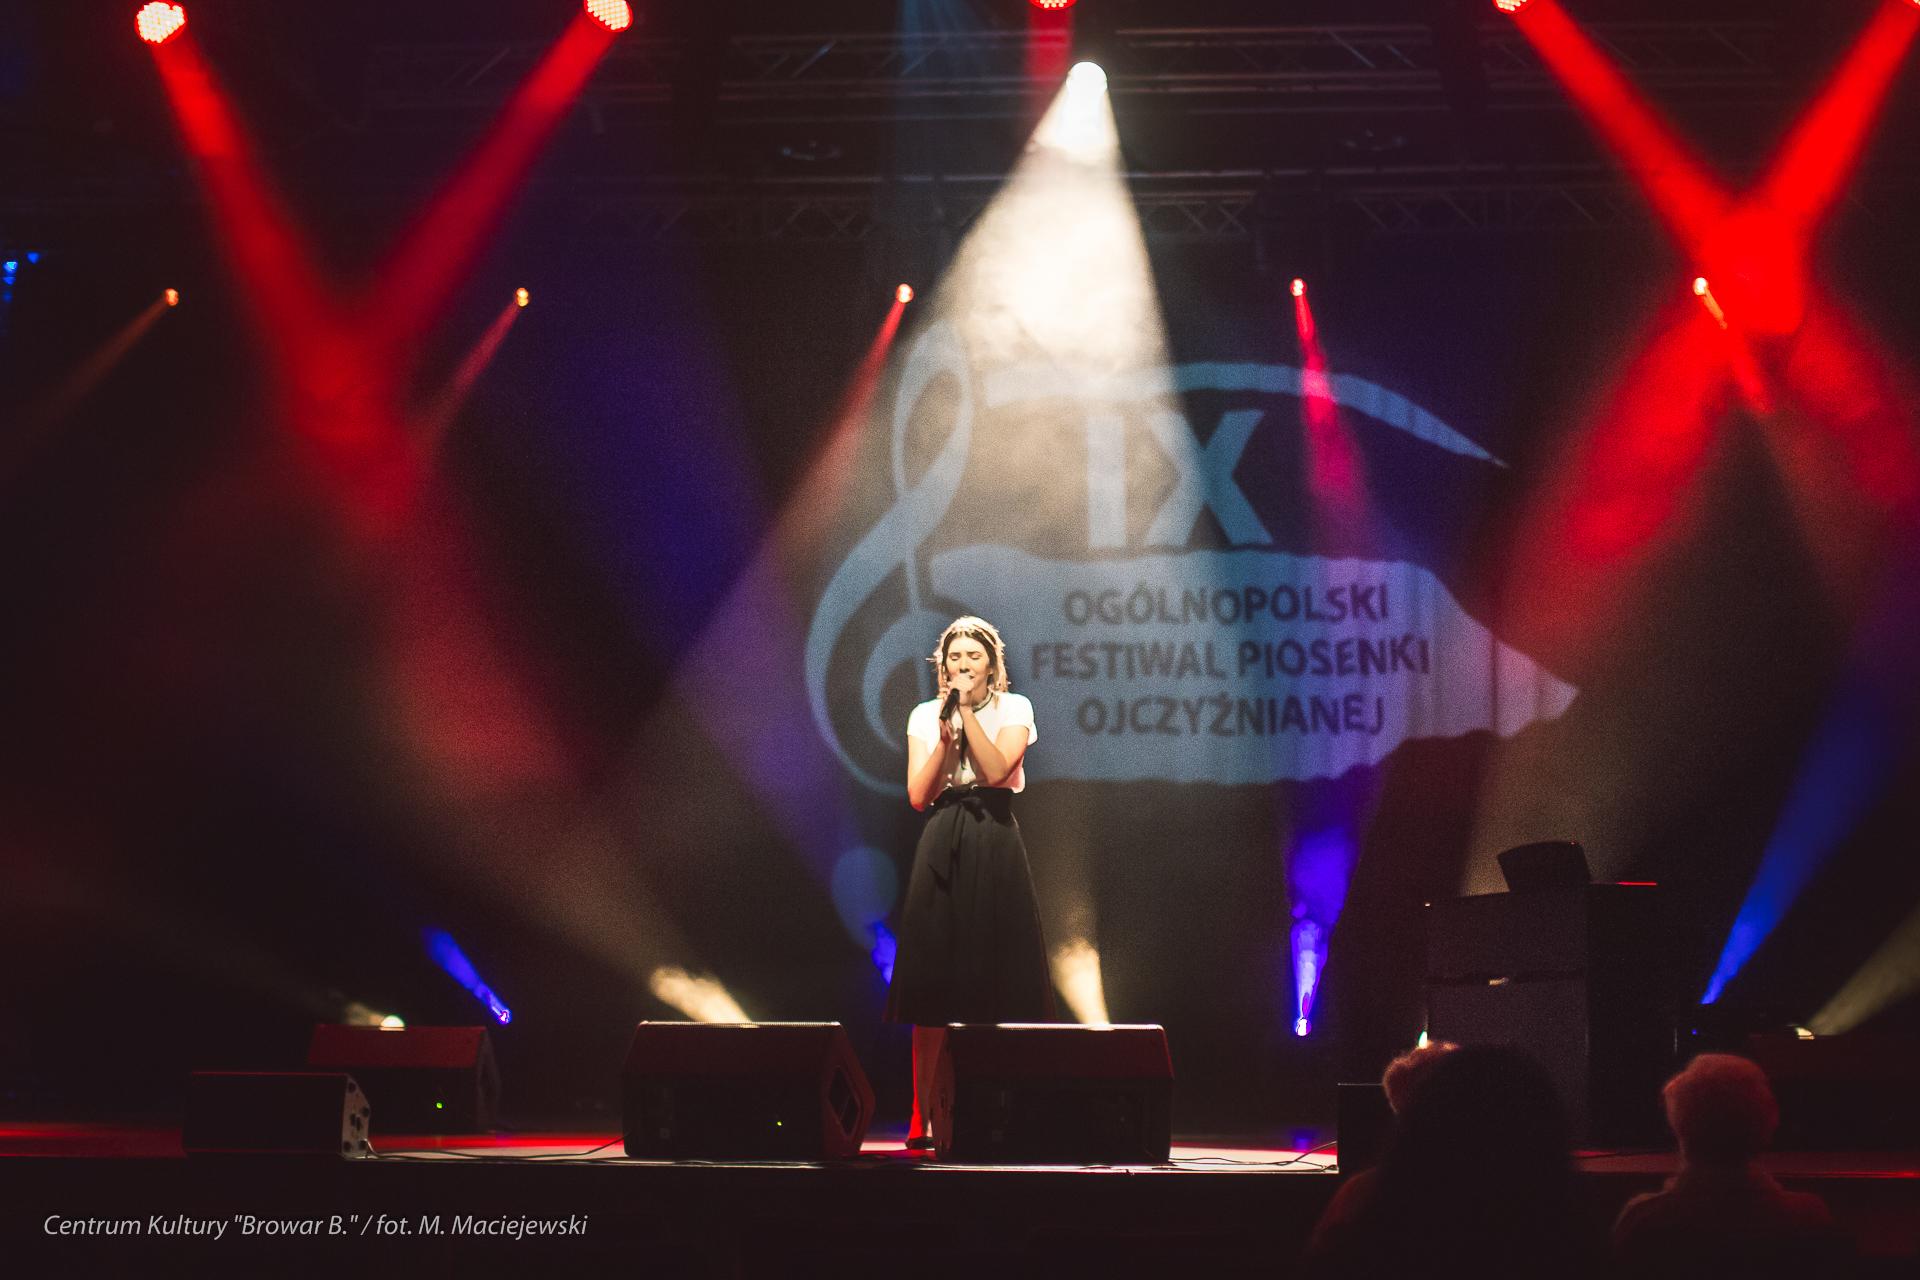 Festiwal-Piosenki-2019-6075